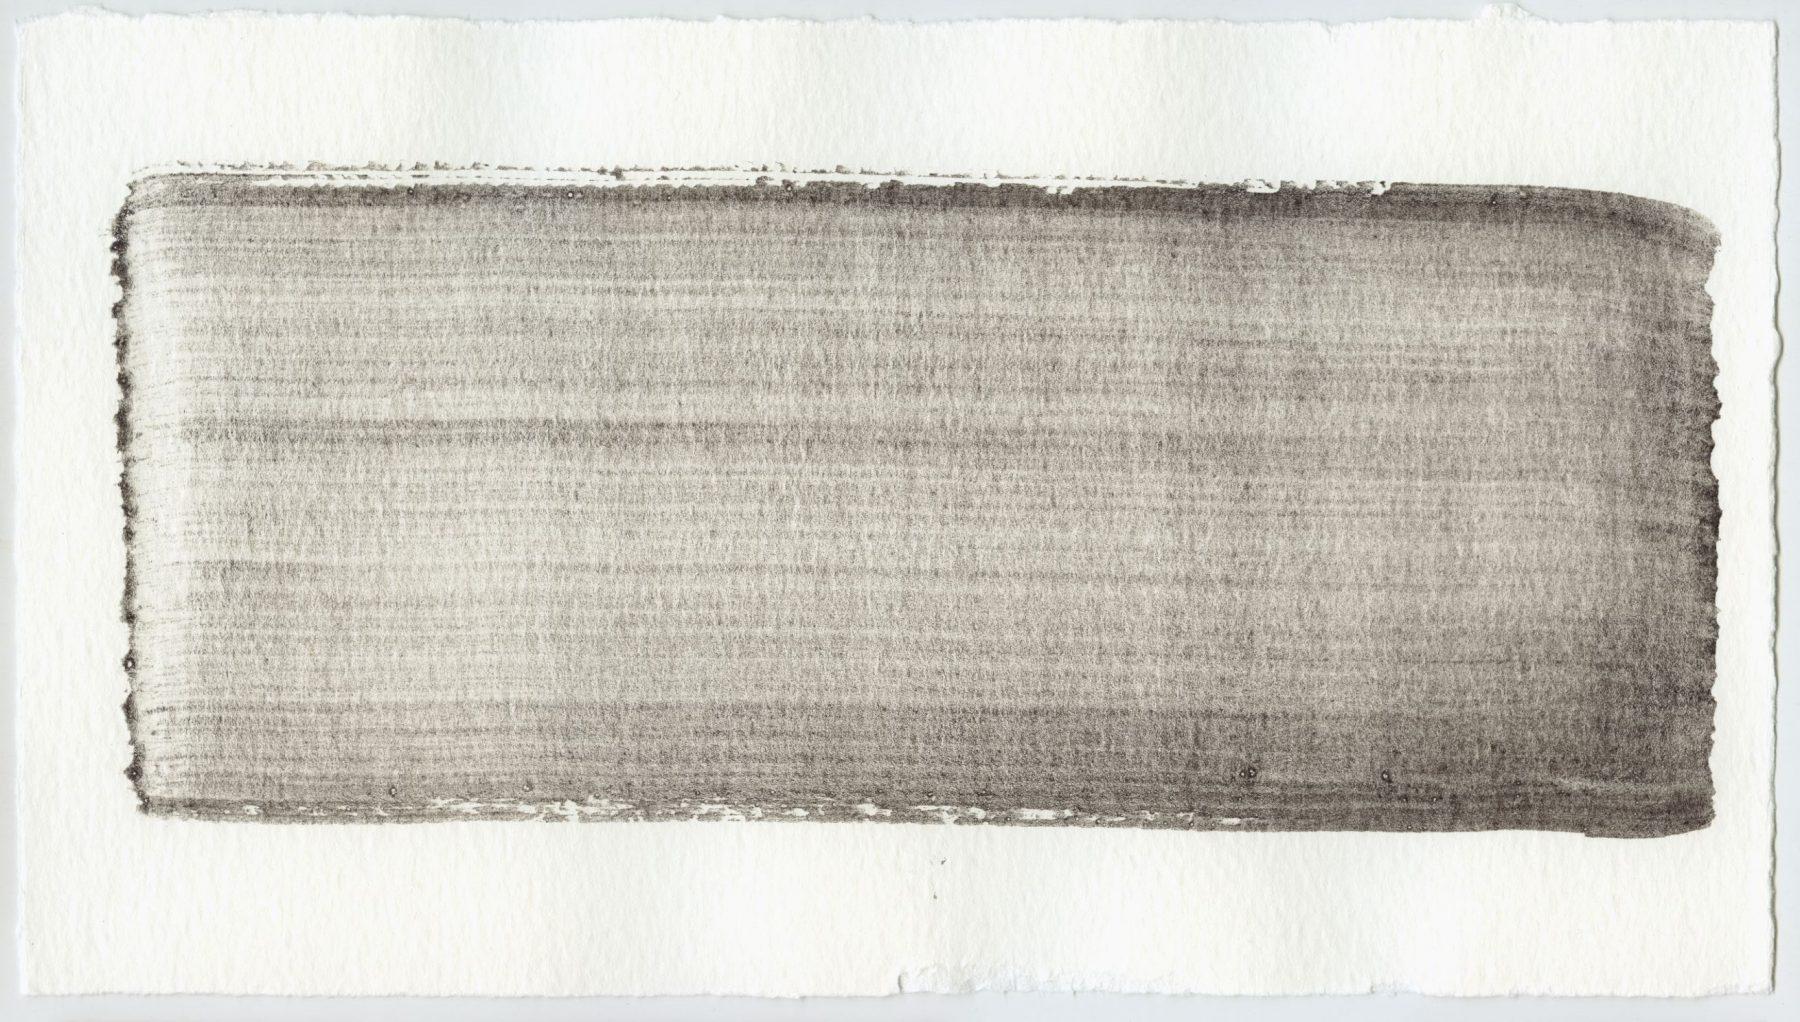 Brush stroke no. 88 - Selfmade pigment: Mortel paarsgrijs middel